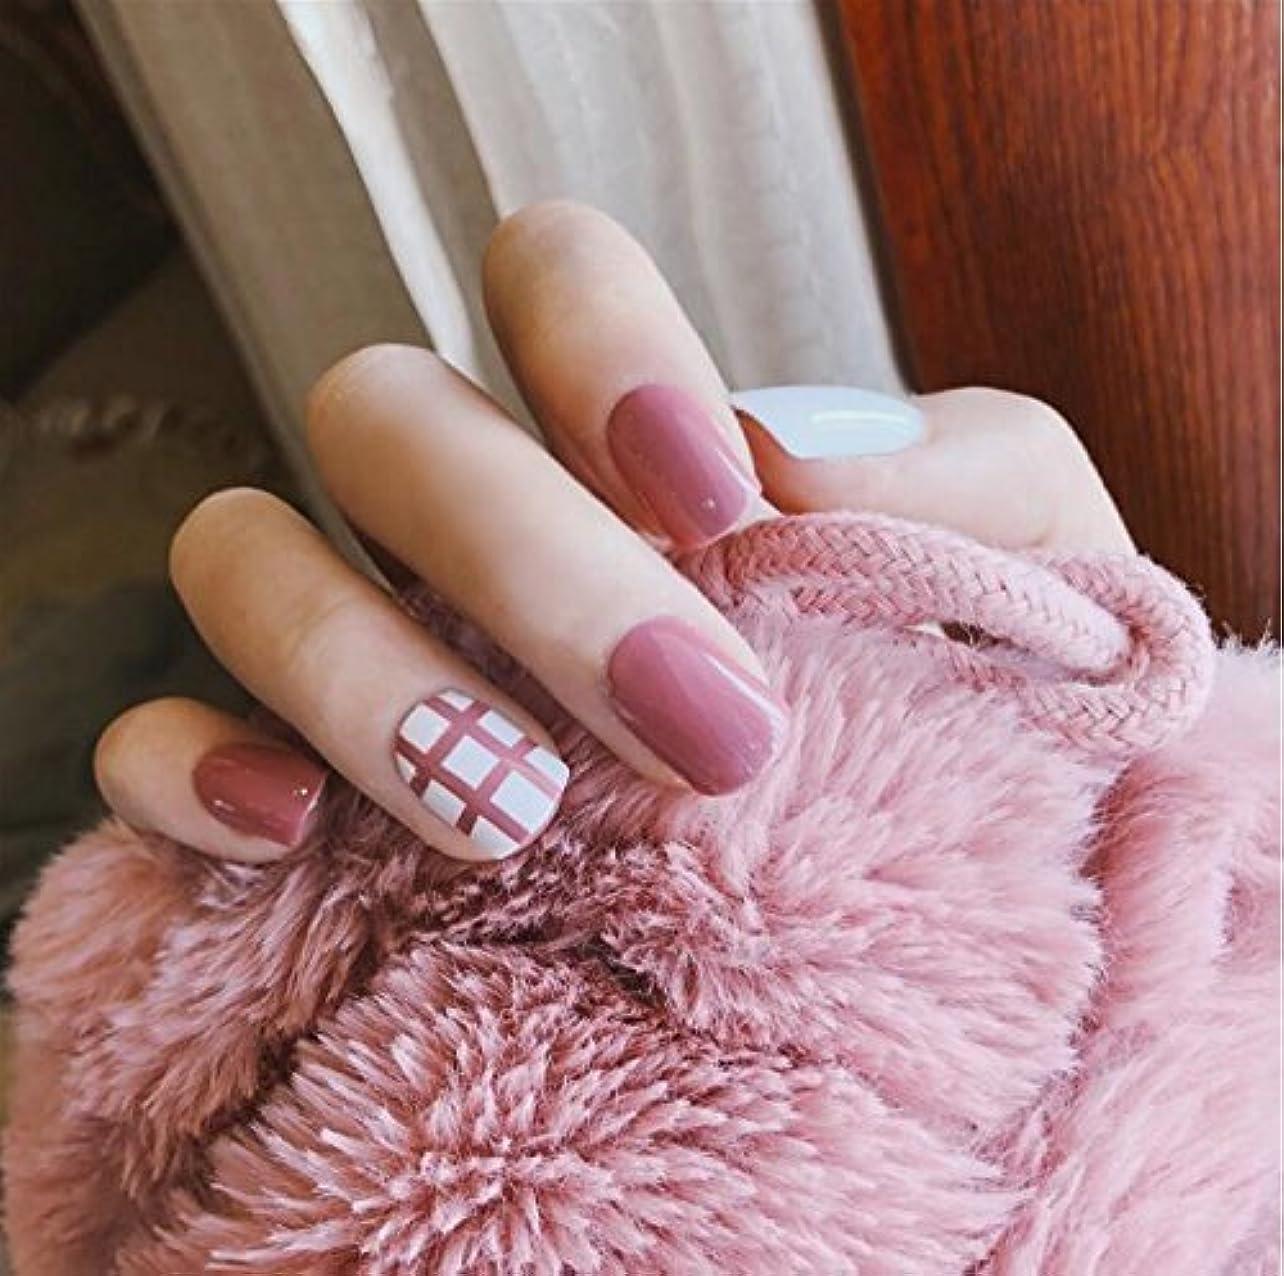 24 pcs ネイルチップ 可愛い ピンク 白 無地 線 短い